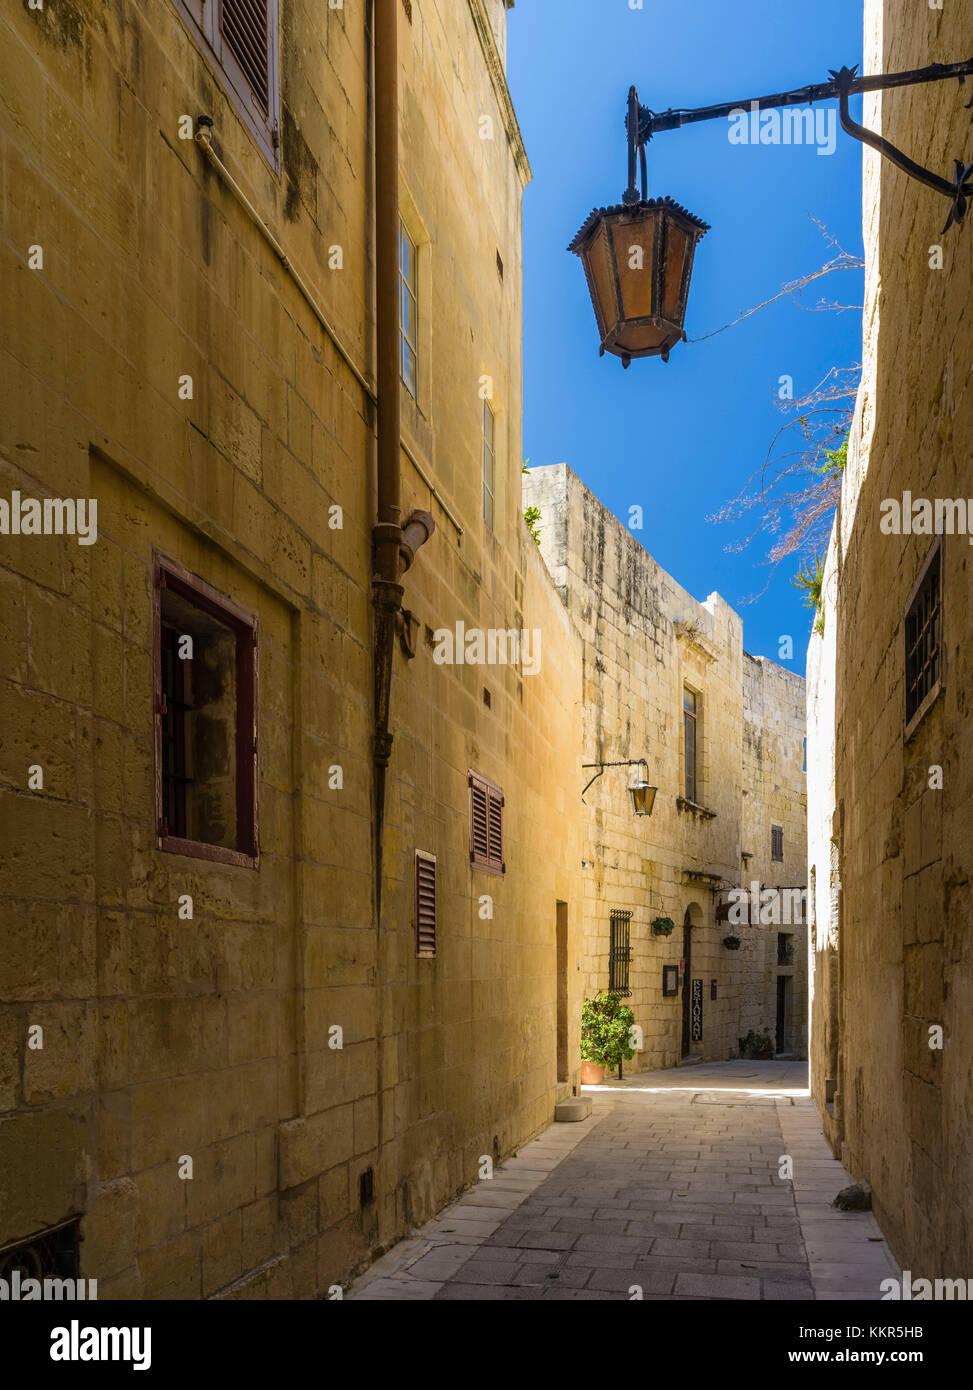 En voie pittoresque ancienne capitale de Malte, Mdina Photo Stock